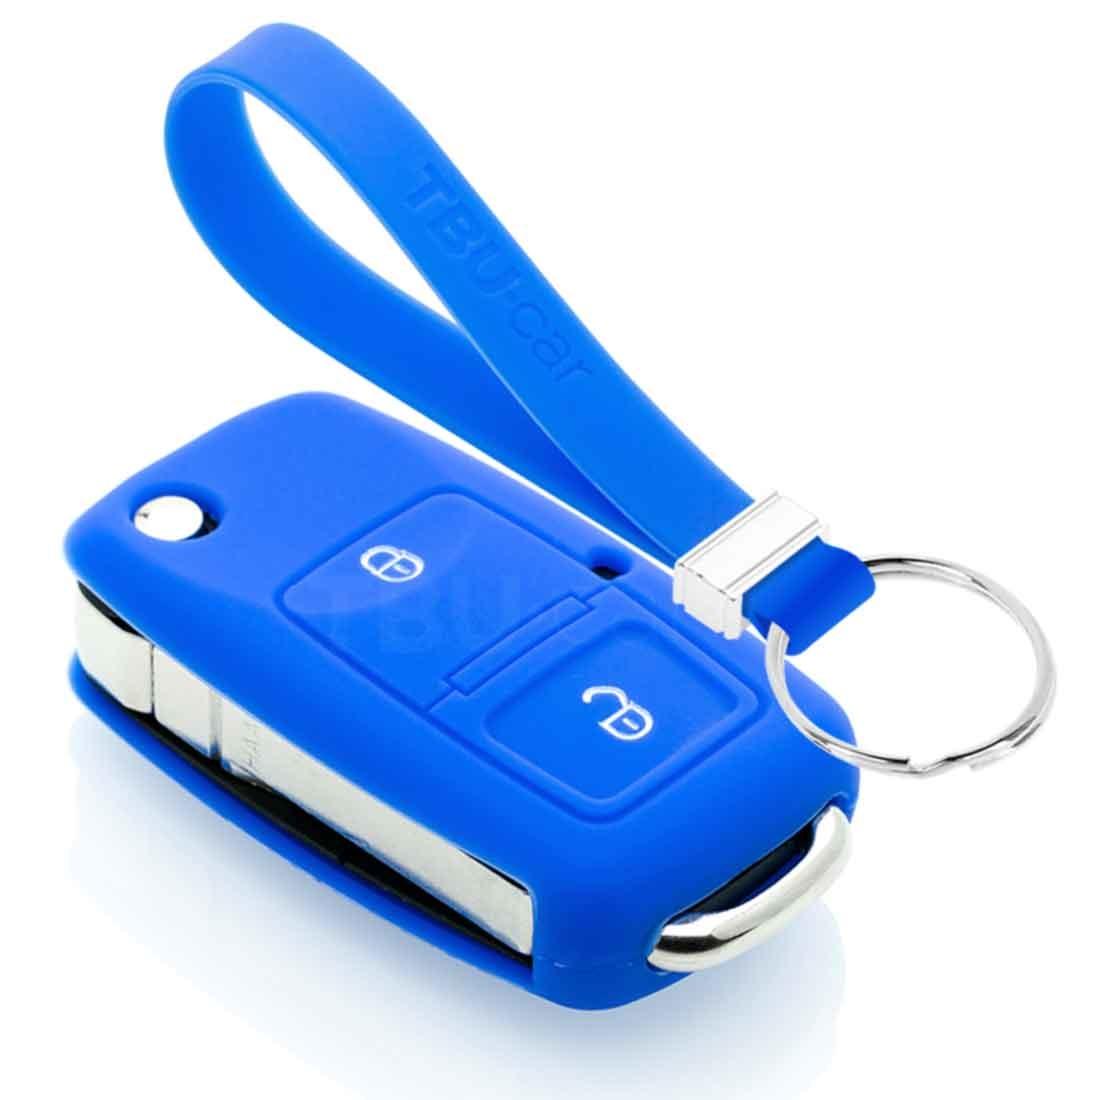 TBU car TBU car Funda Carcasa llave compatible con Audi - Funda de Silicona - Cover de Llave Coche - Azul